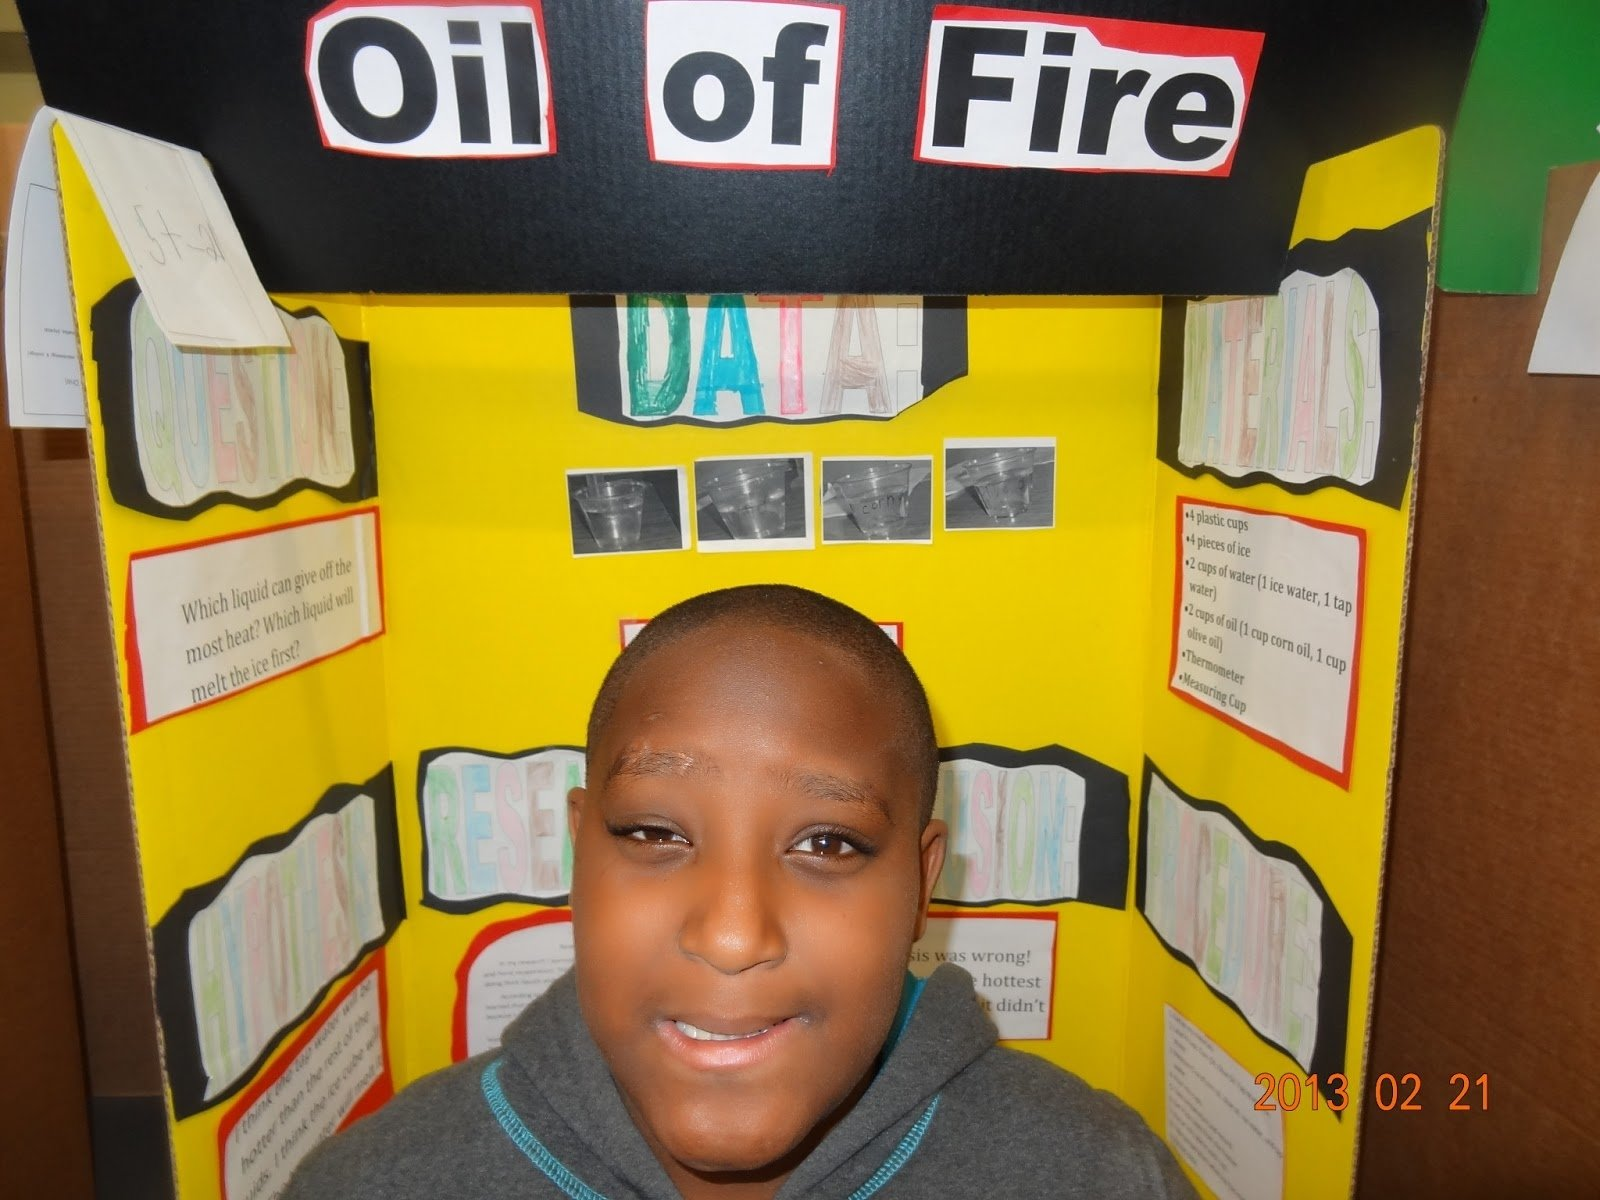 10 Elegant Science Fair Ideas For 5Th Graders nokw woodwork 5th grade 8th grade science fair projects info 30